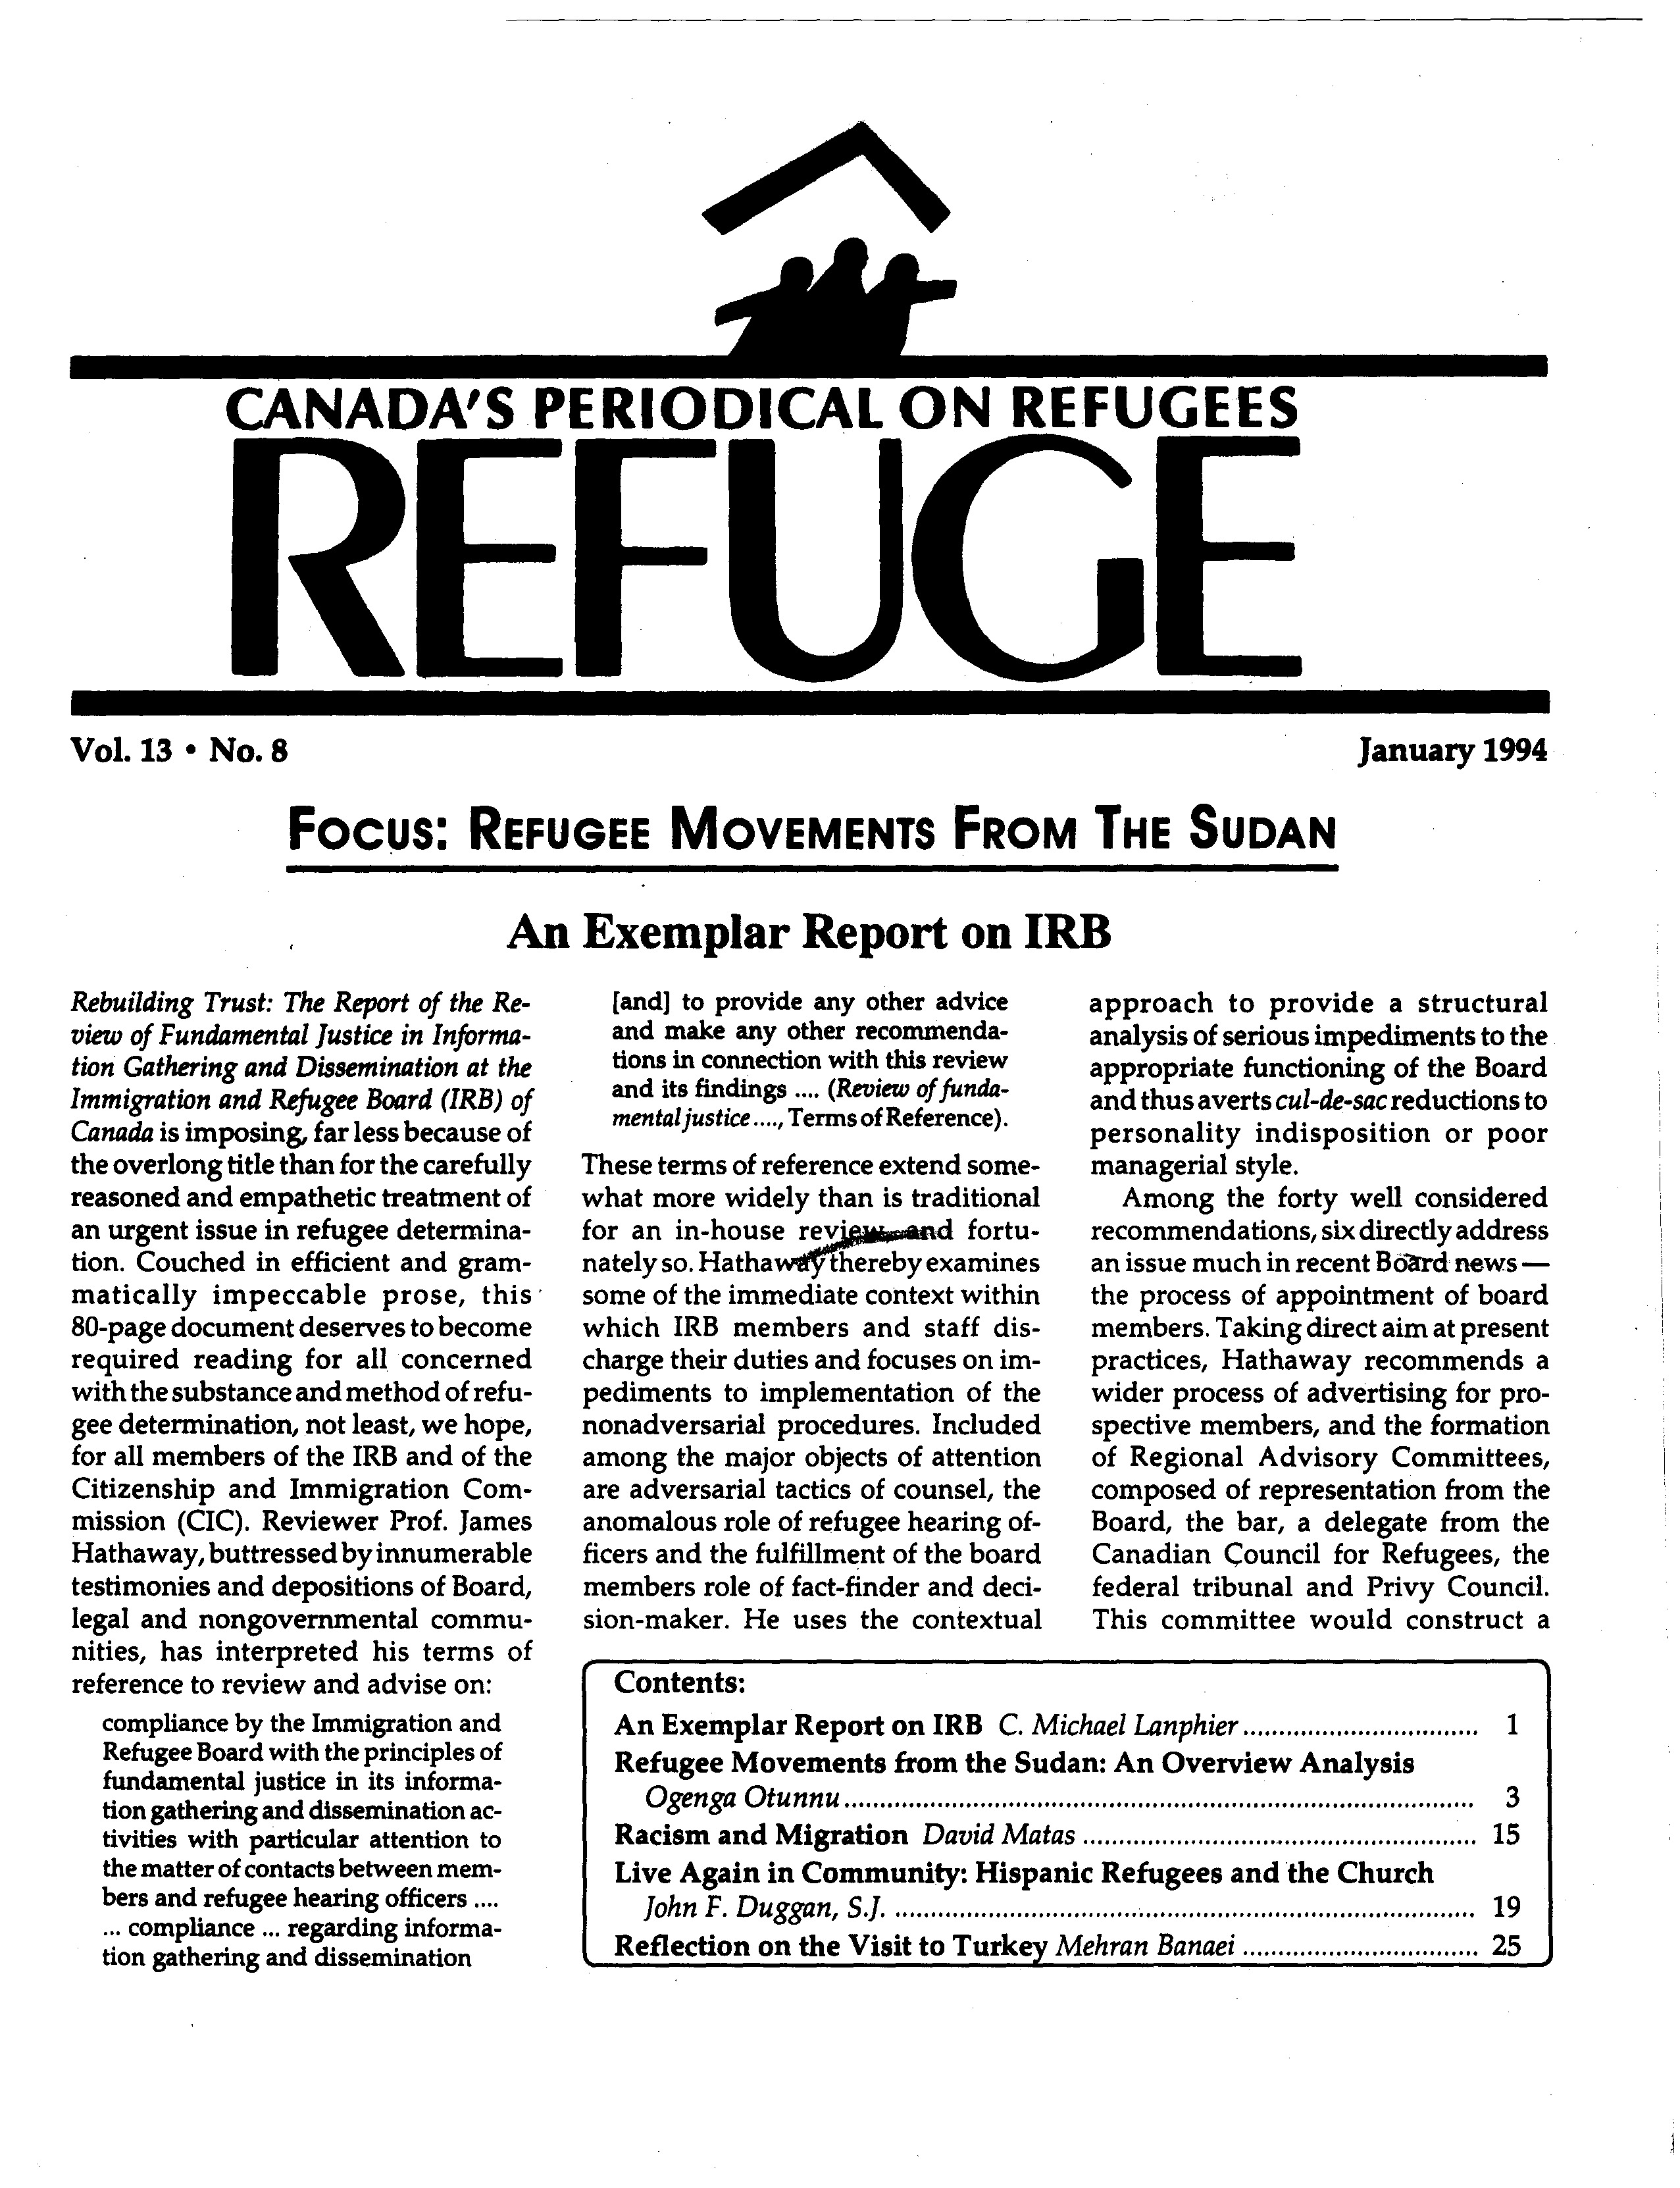 first page Refuge vol. 13.8 1994